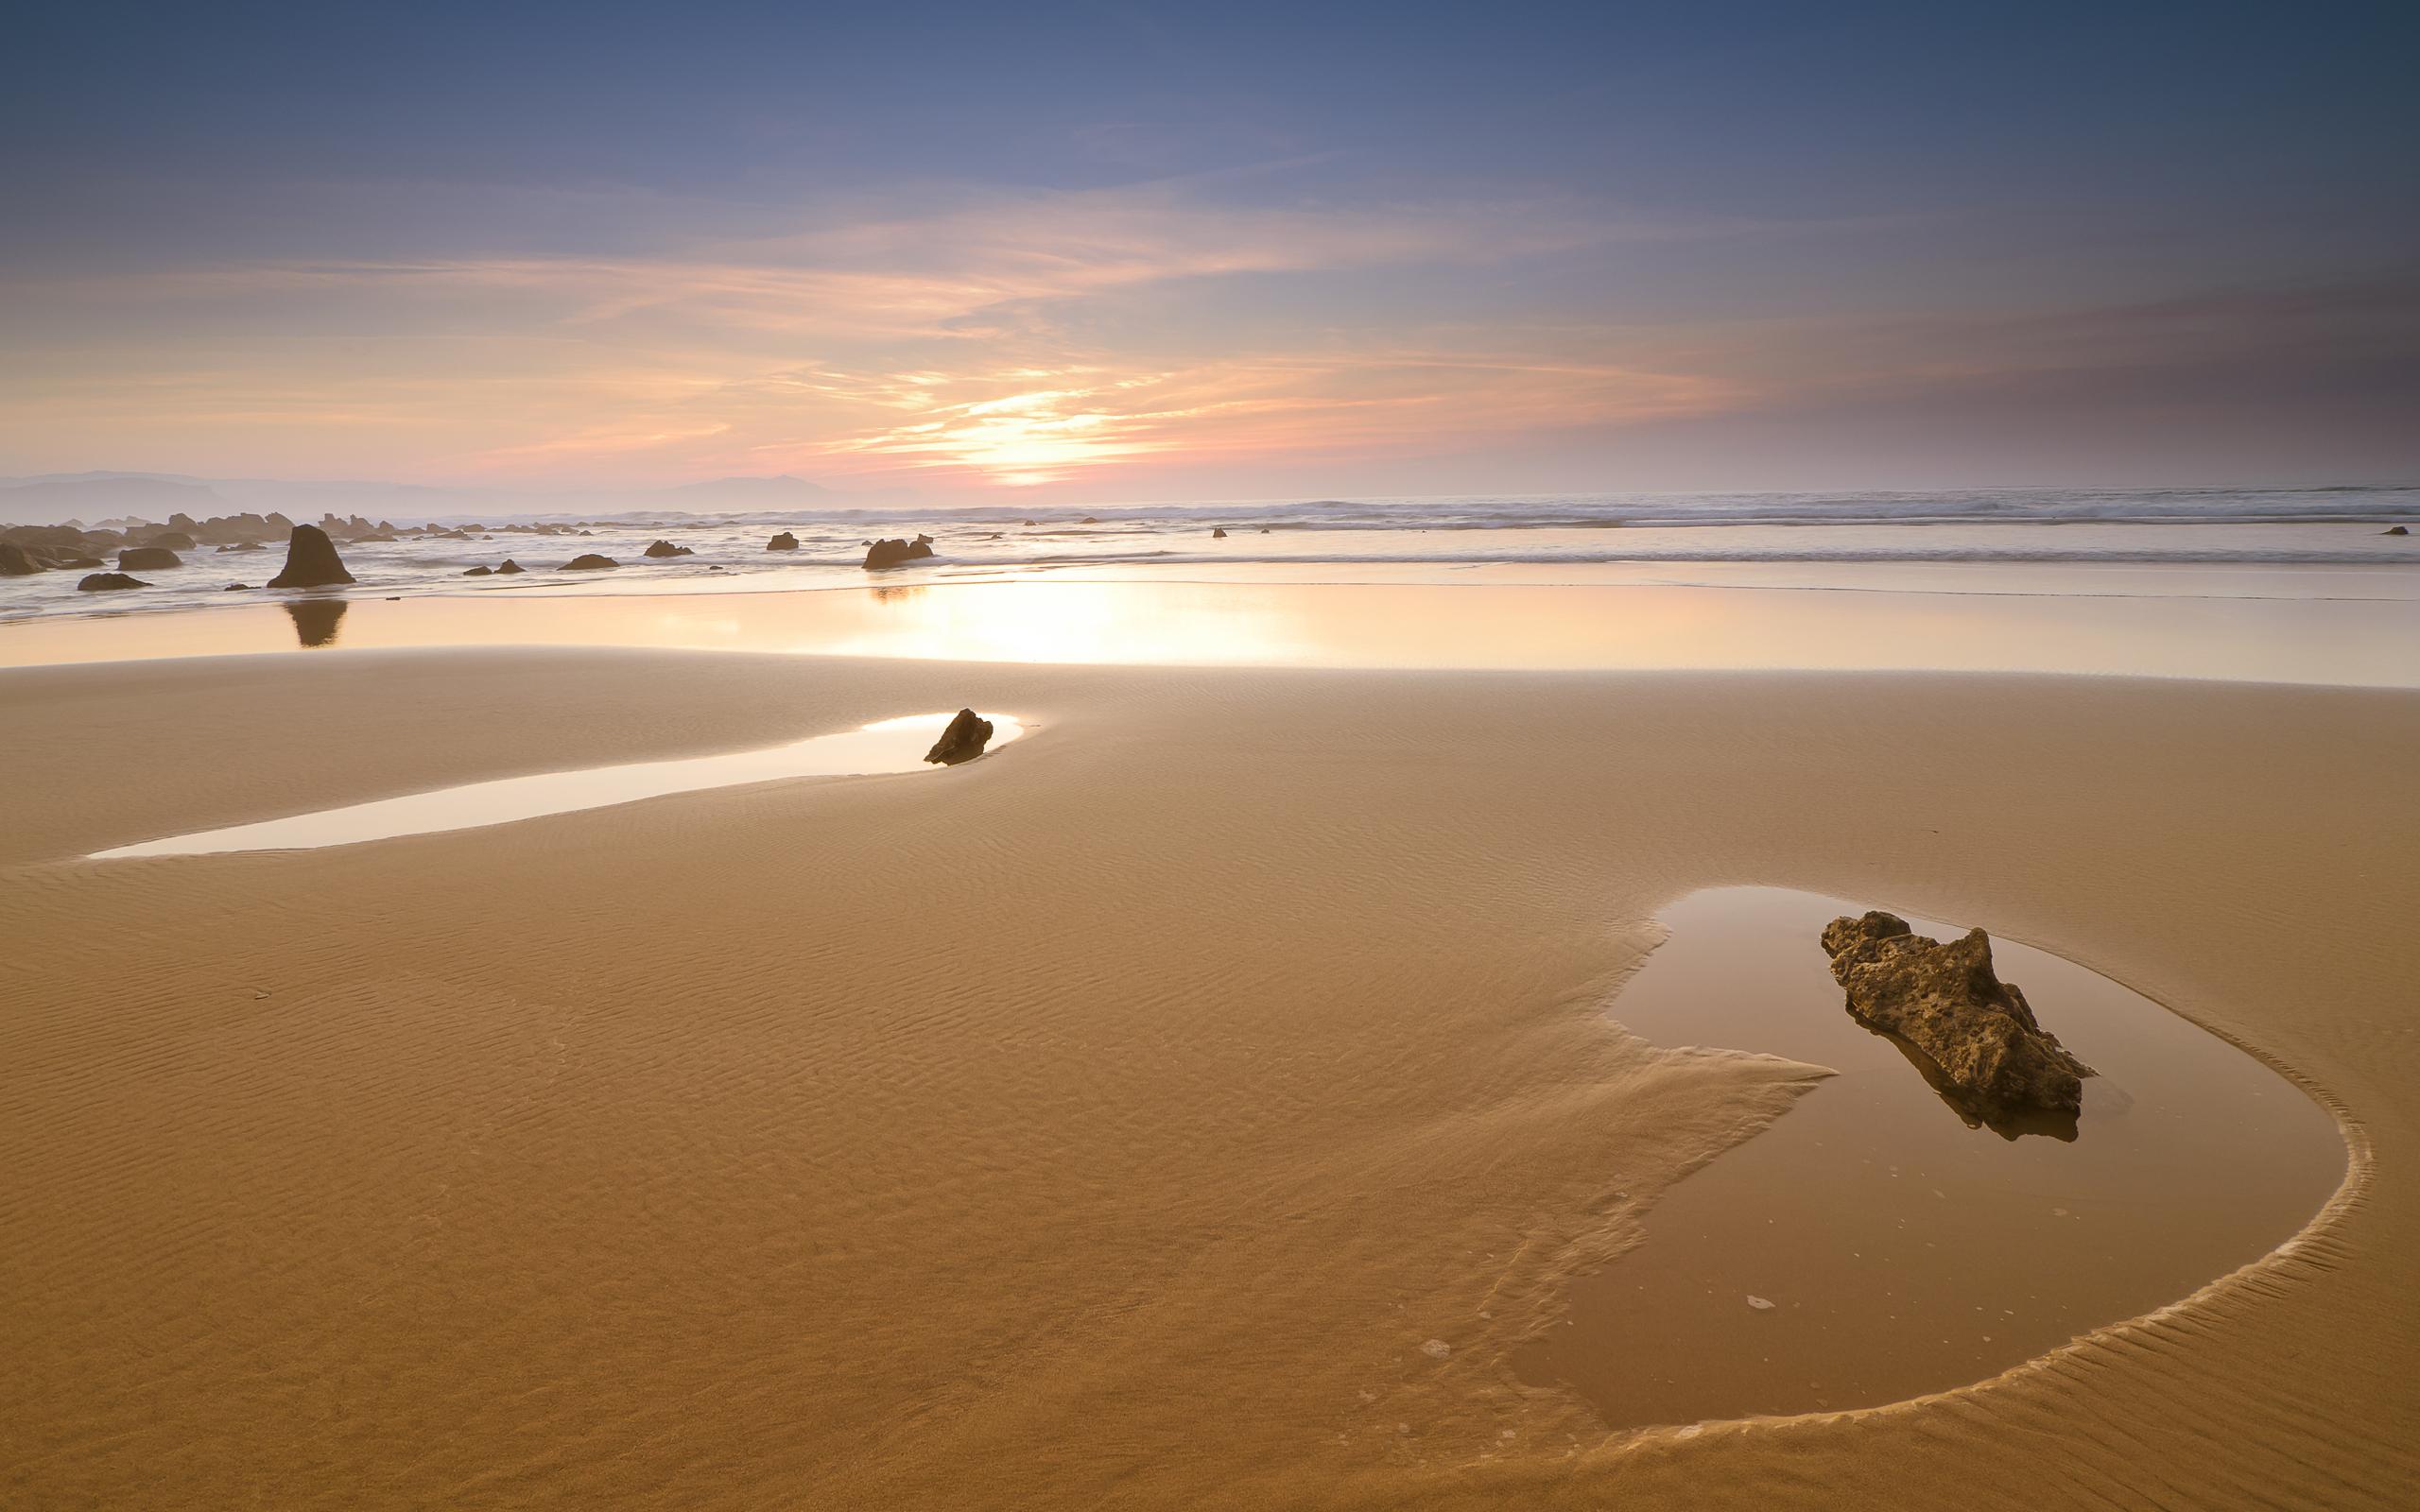 закат камень берег море sunset stone shore sea  № 1023709 бесплатно